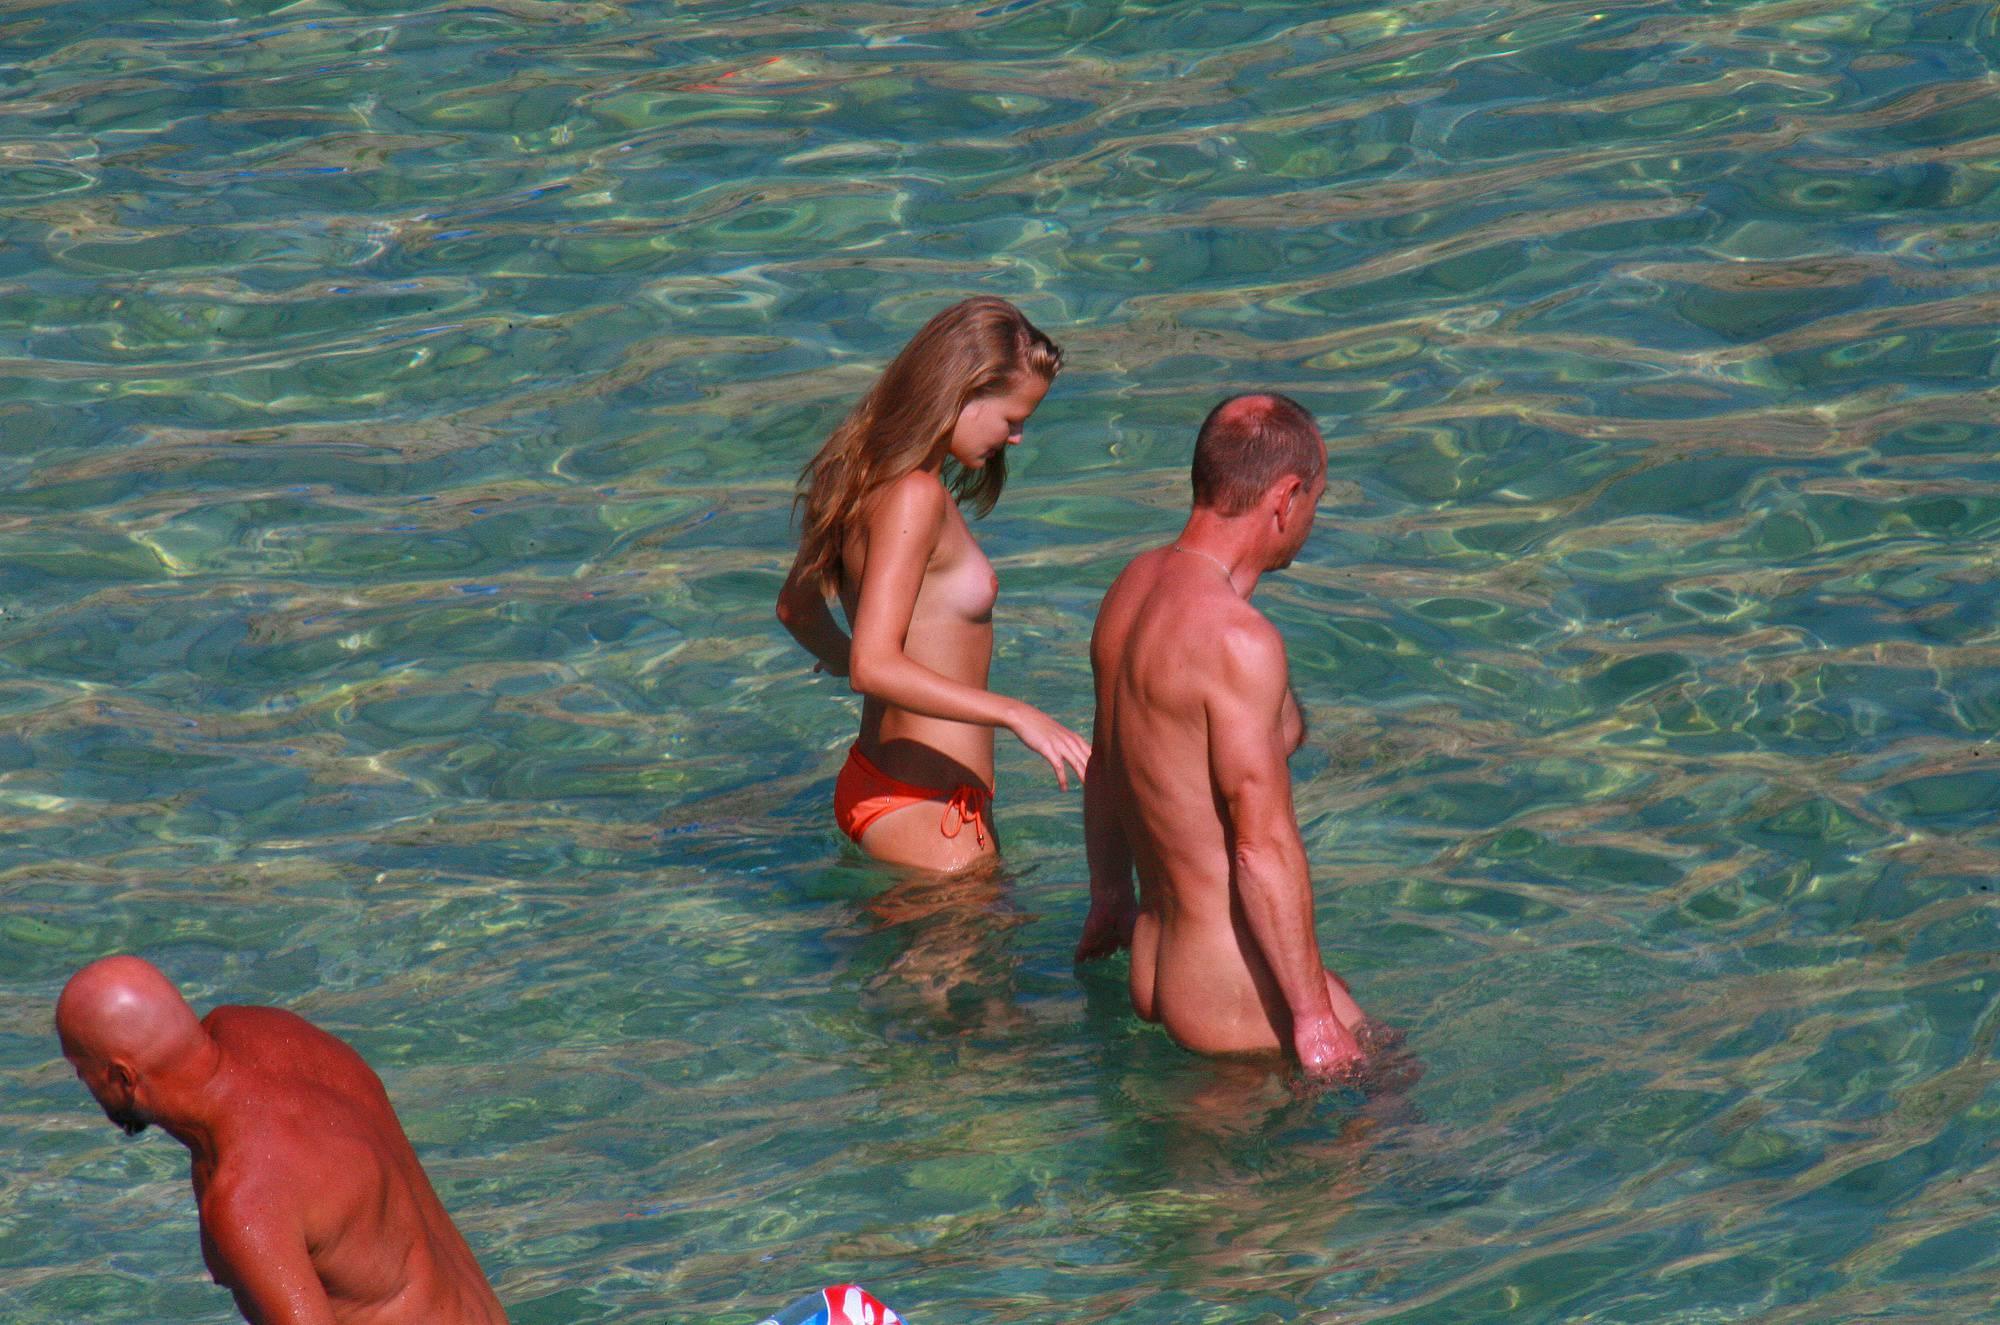 Ula FKK Topless Sister Site - 2